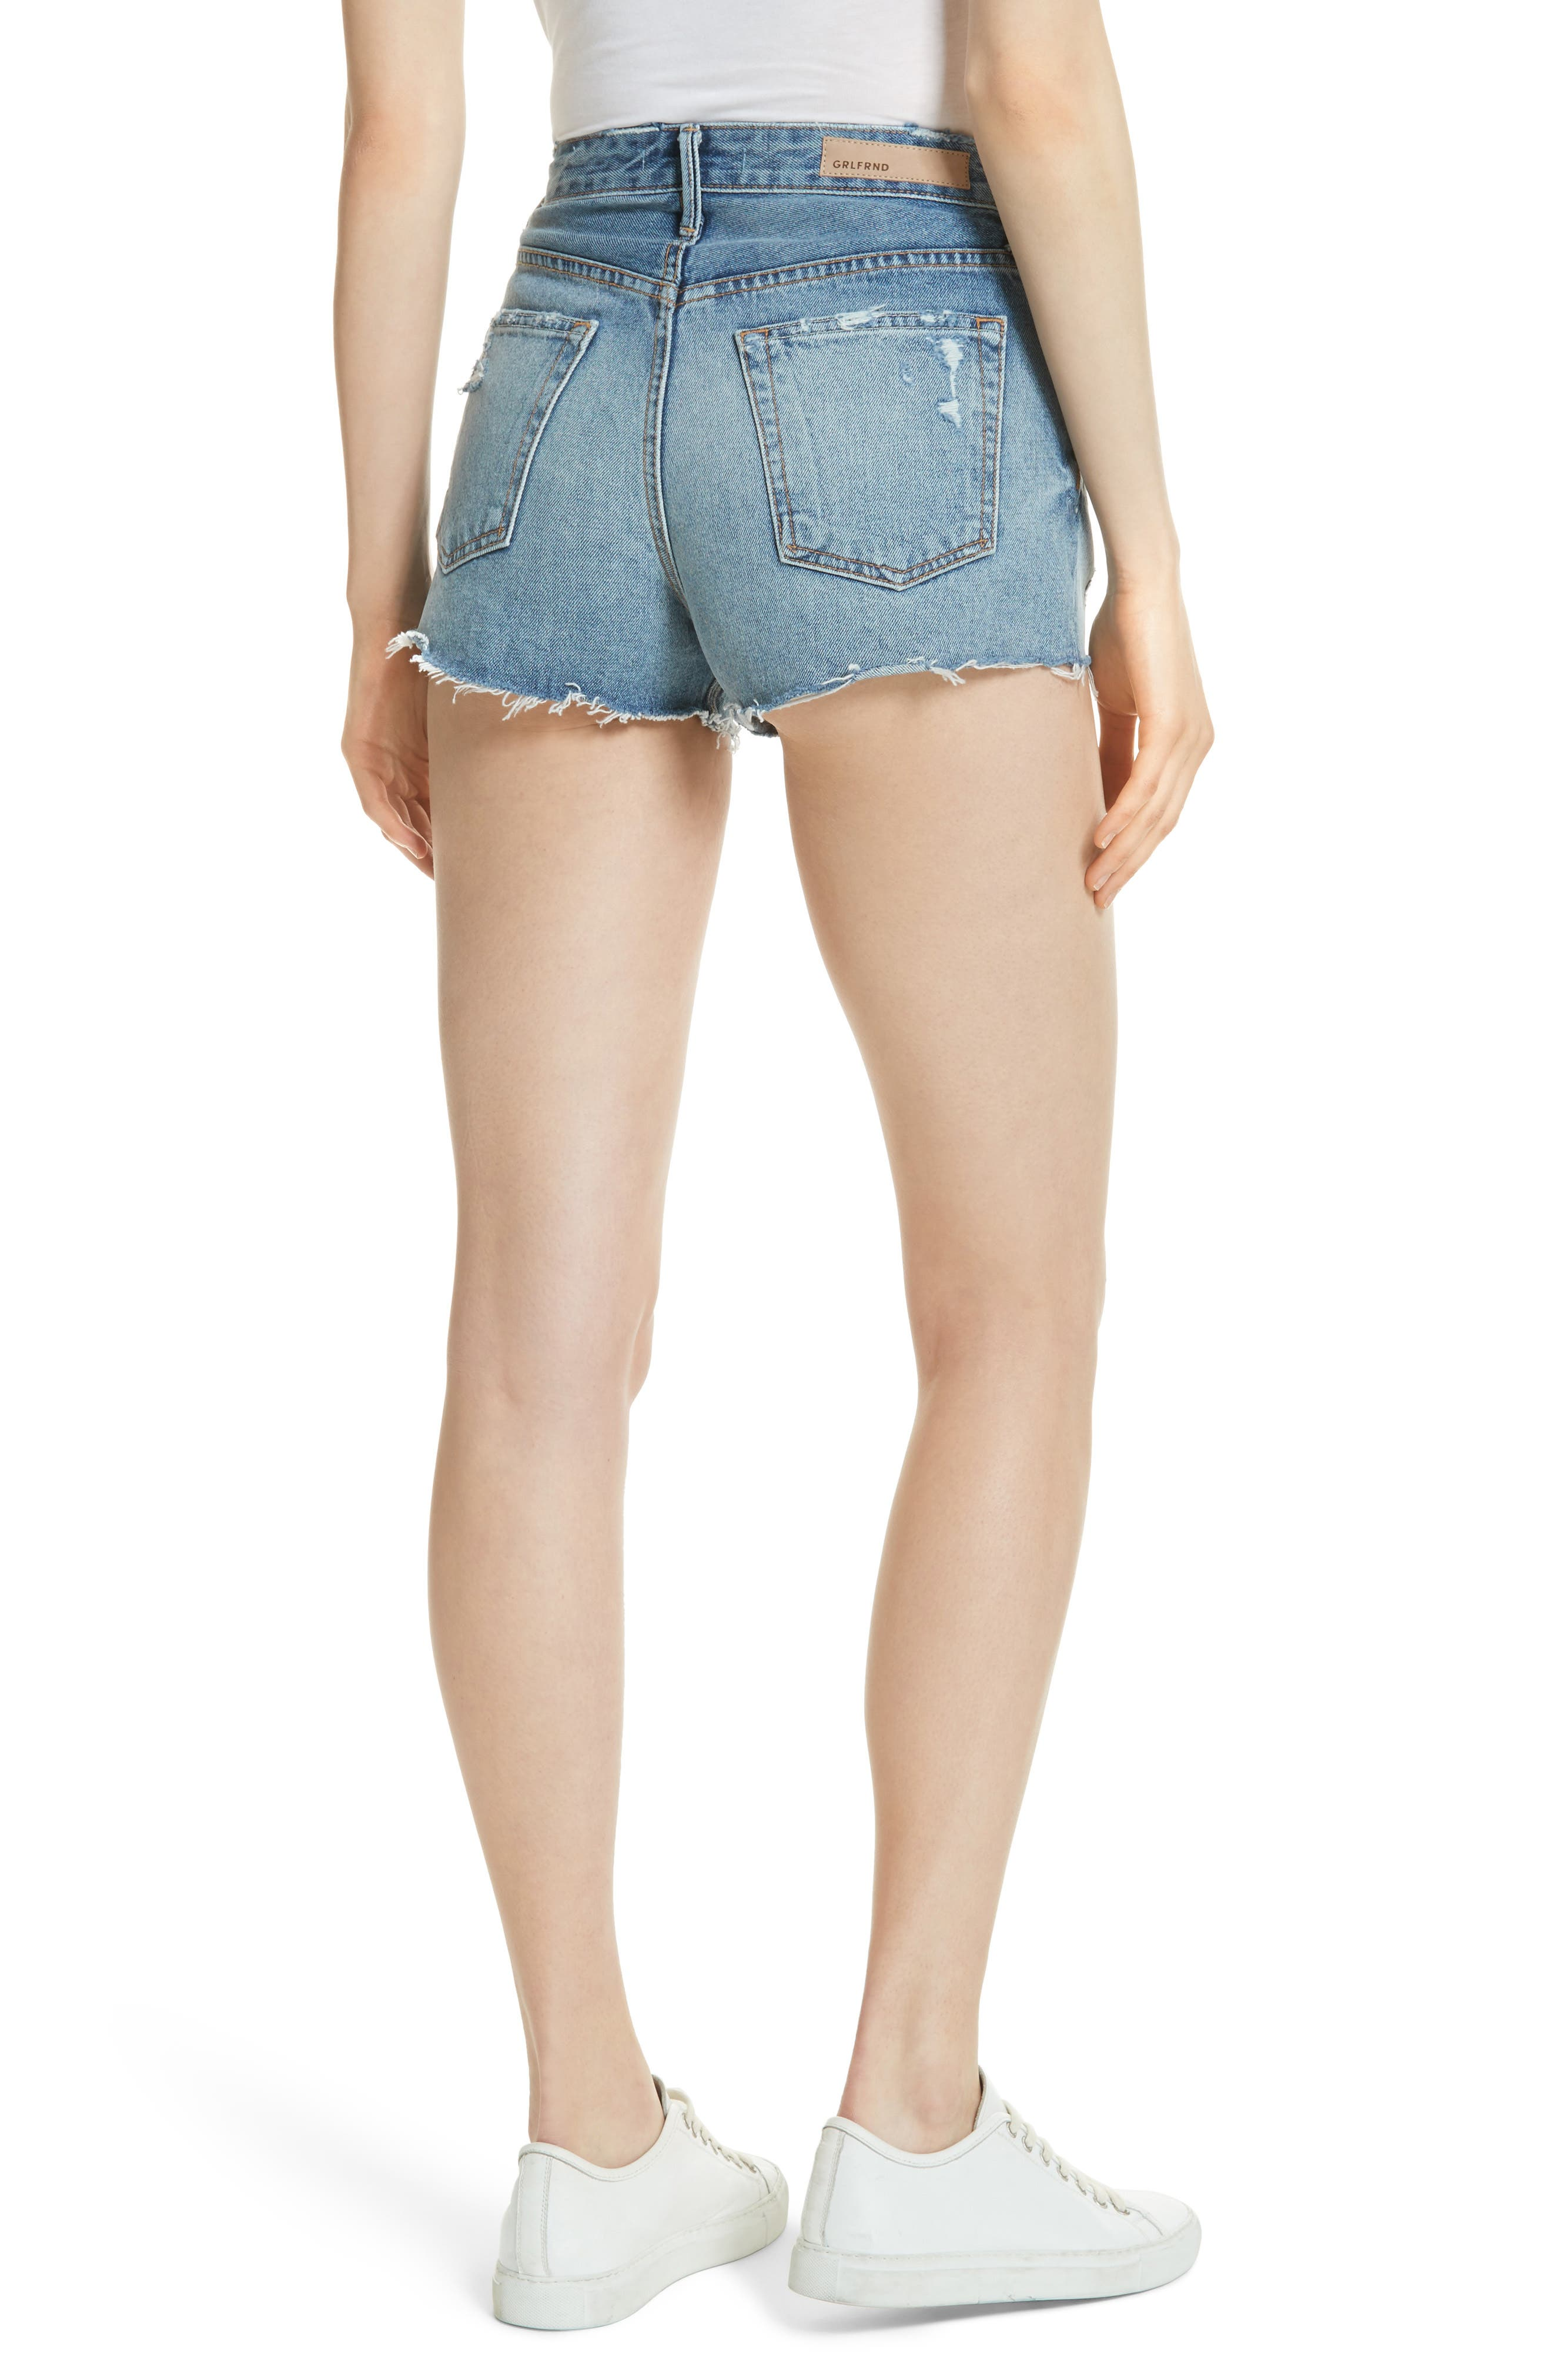 Cindy Rigid High Waist Denim Shorts,                             Alternate thumbnail 2, color,                             Stoned G601